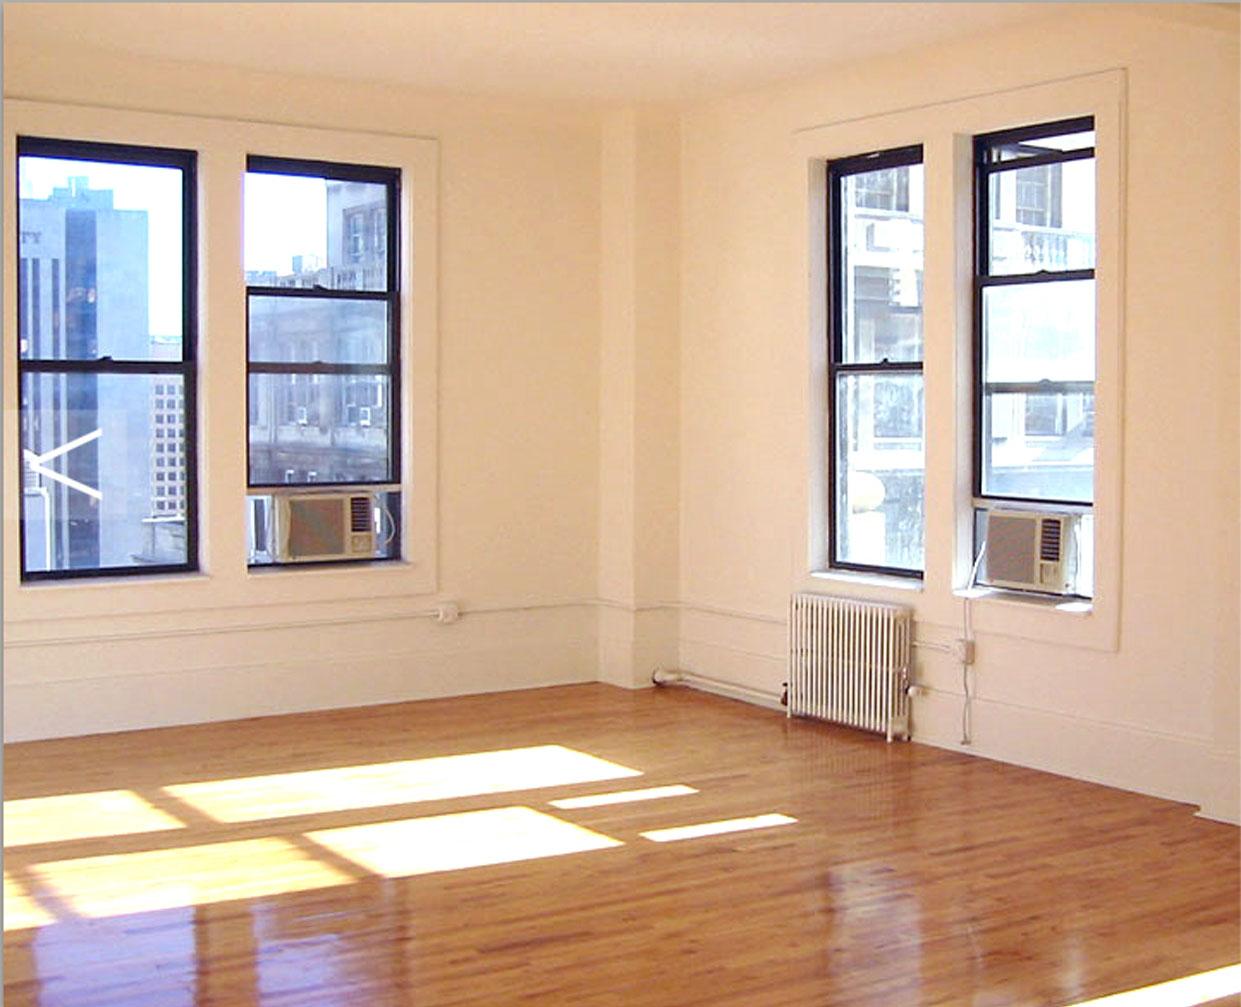 135 William Street Apartments For Rent In Financial District Luxury Rentals Manhattan